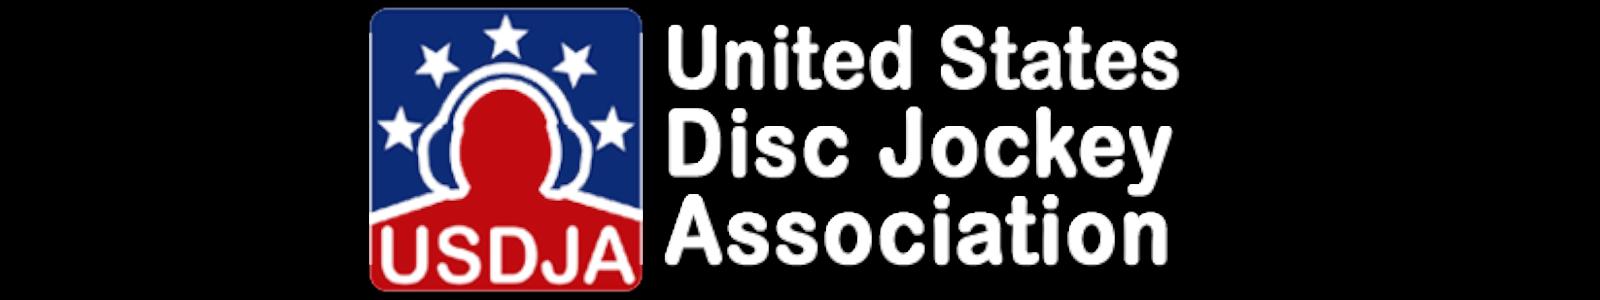 United States Disc Jockey Association - Business sponsor of The DJ Sessions